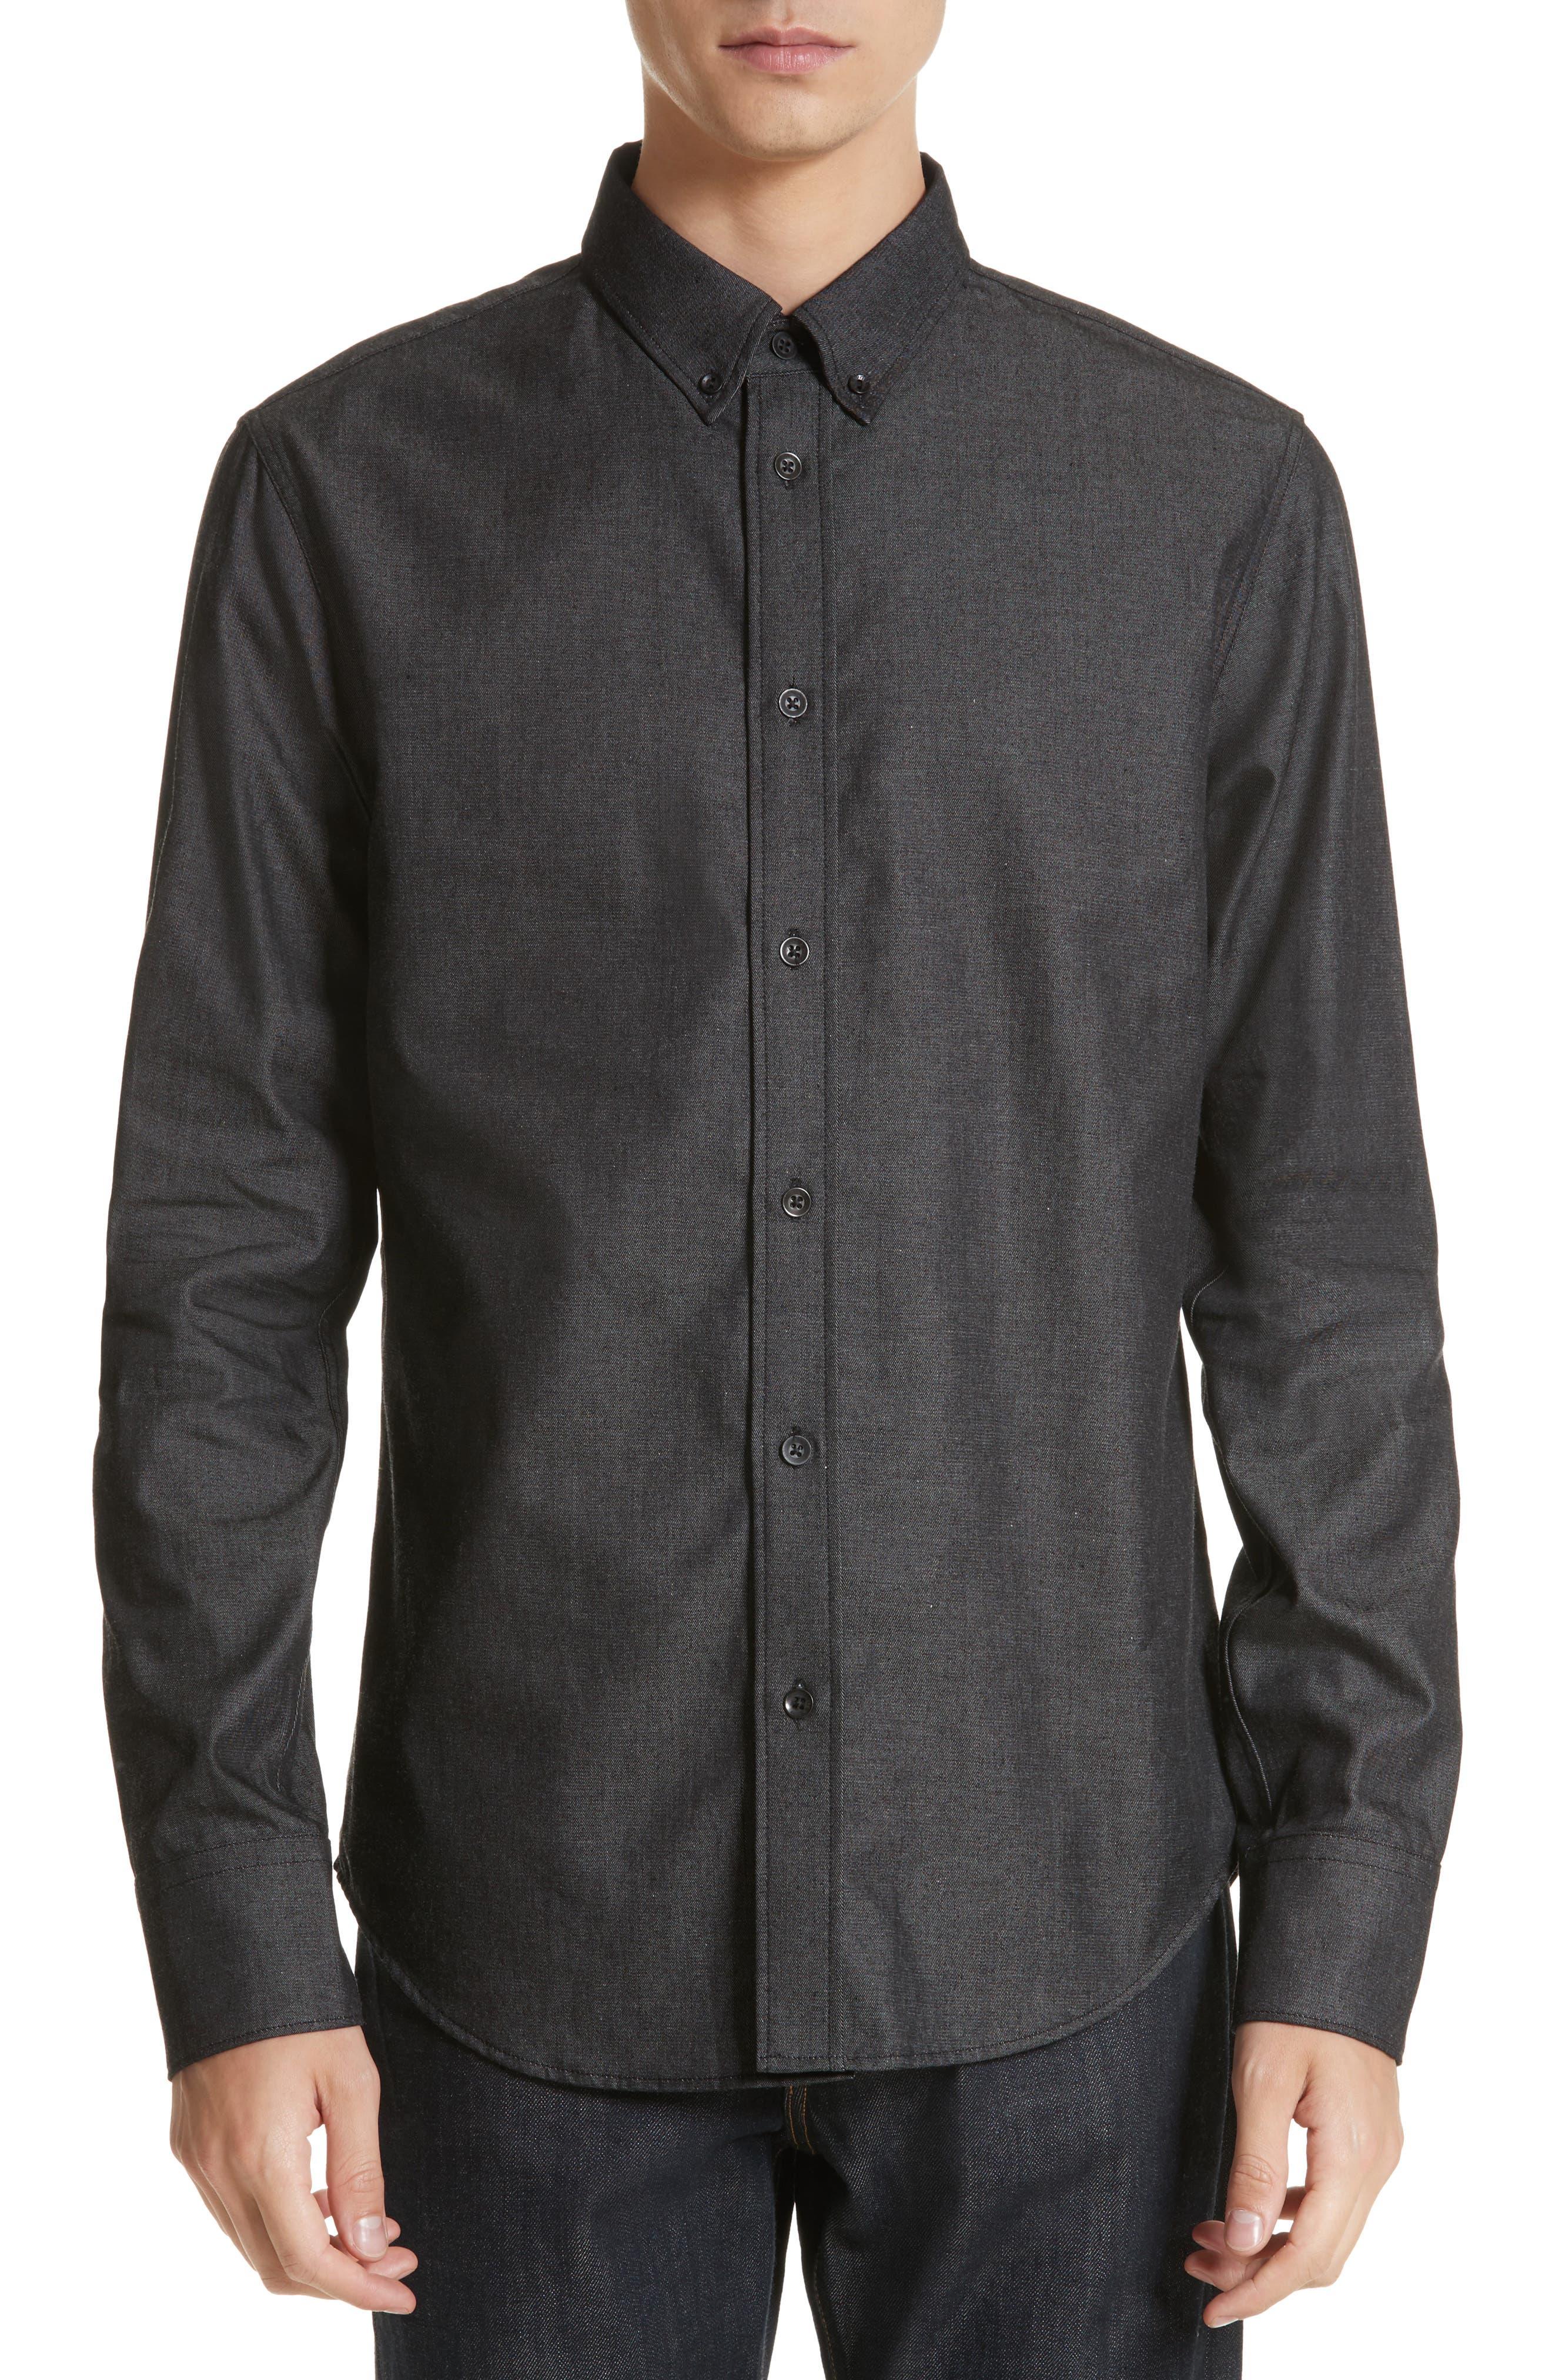 Fit 2 Tomlin Shirt,                         Main,                         color, Black